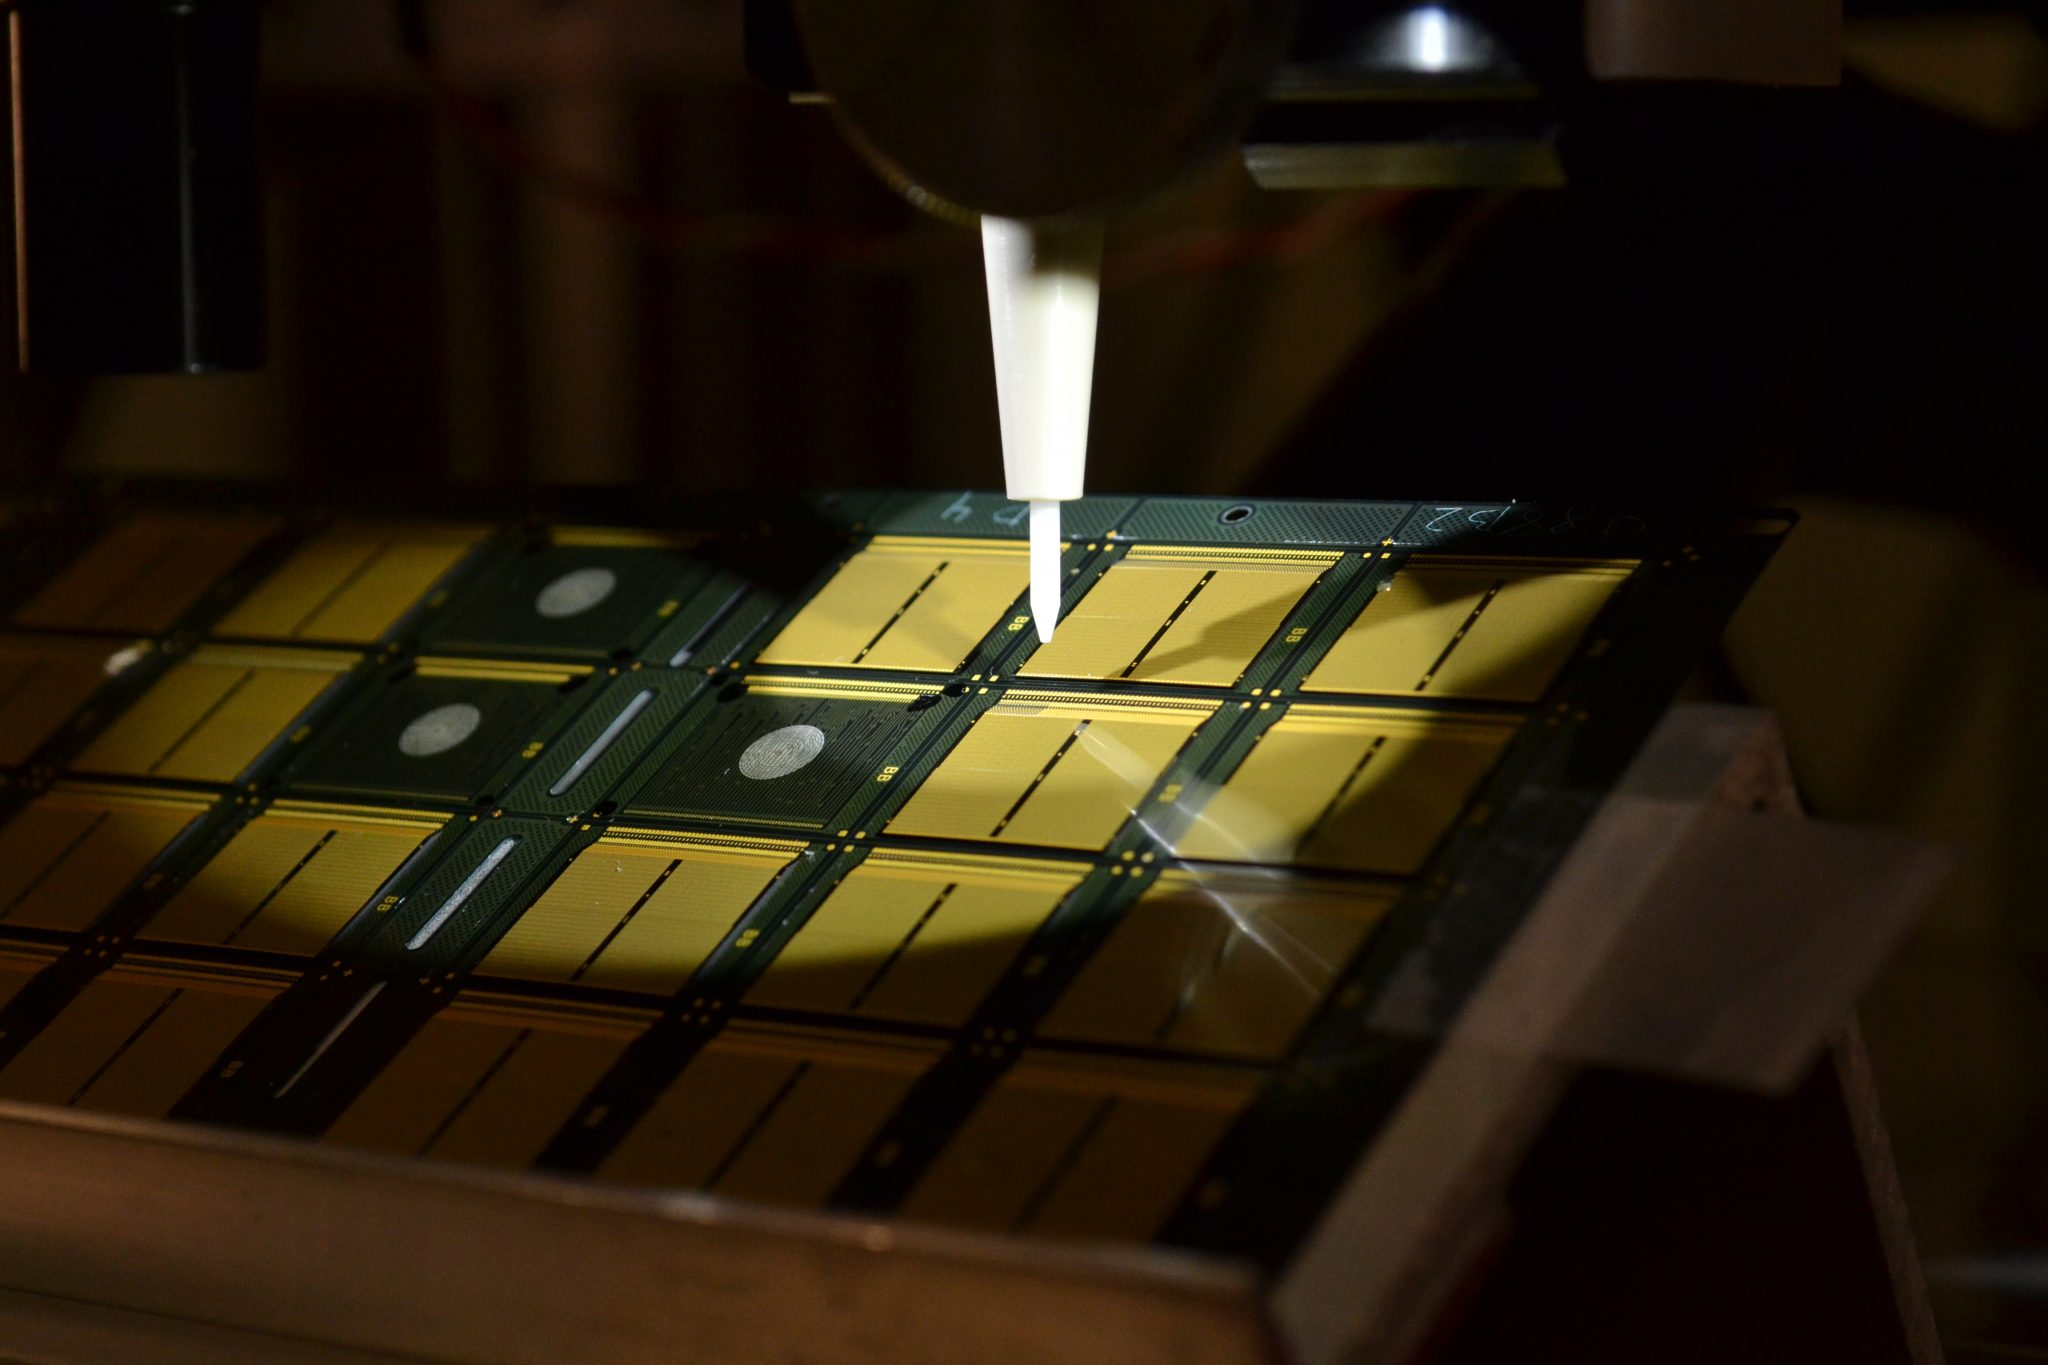 Optomec stacked die electronics 3D printing certification. Photo via Optomec